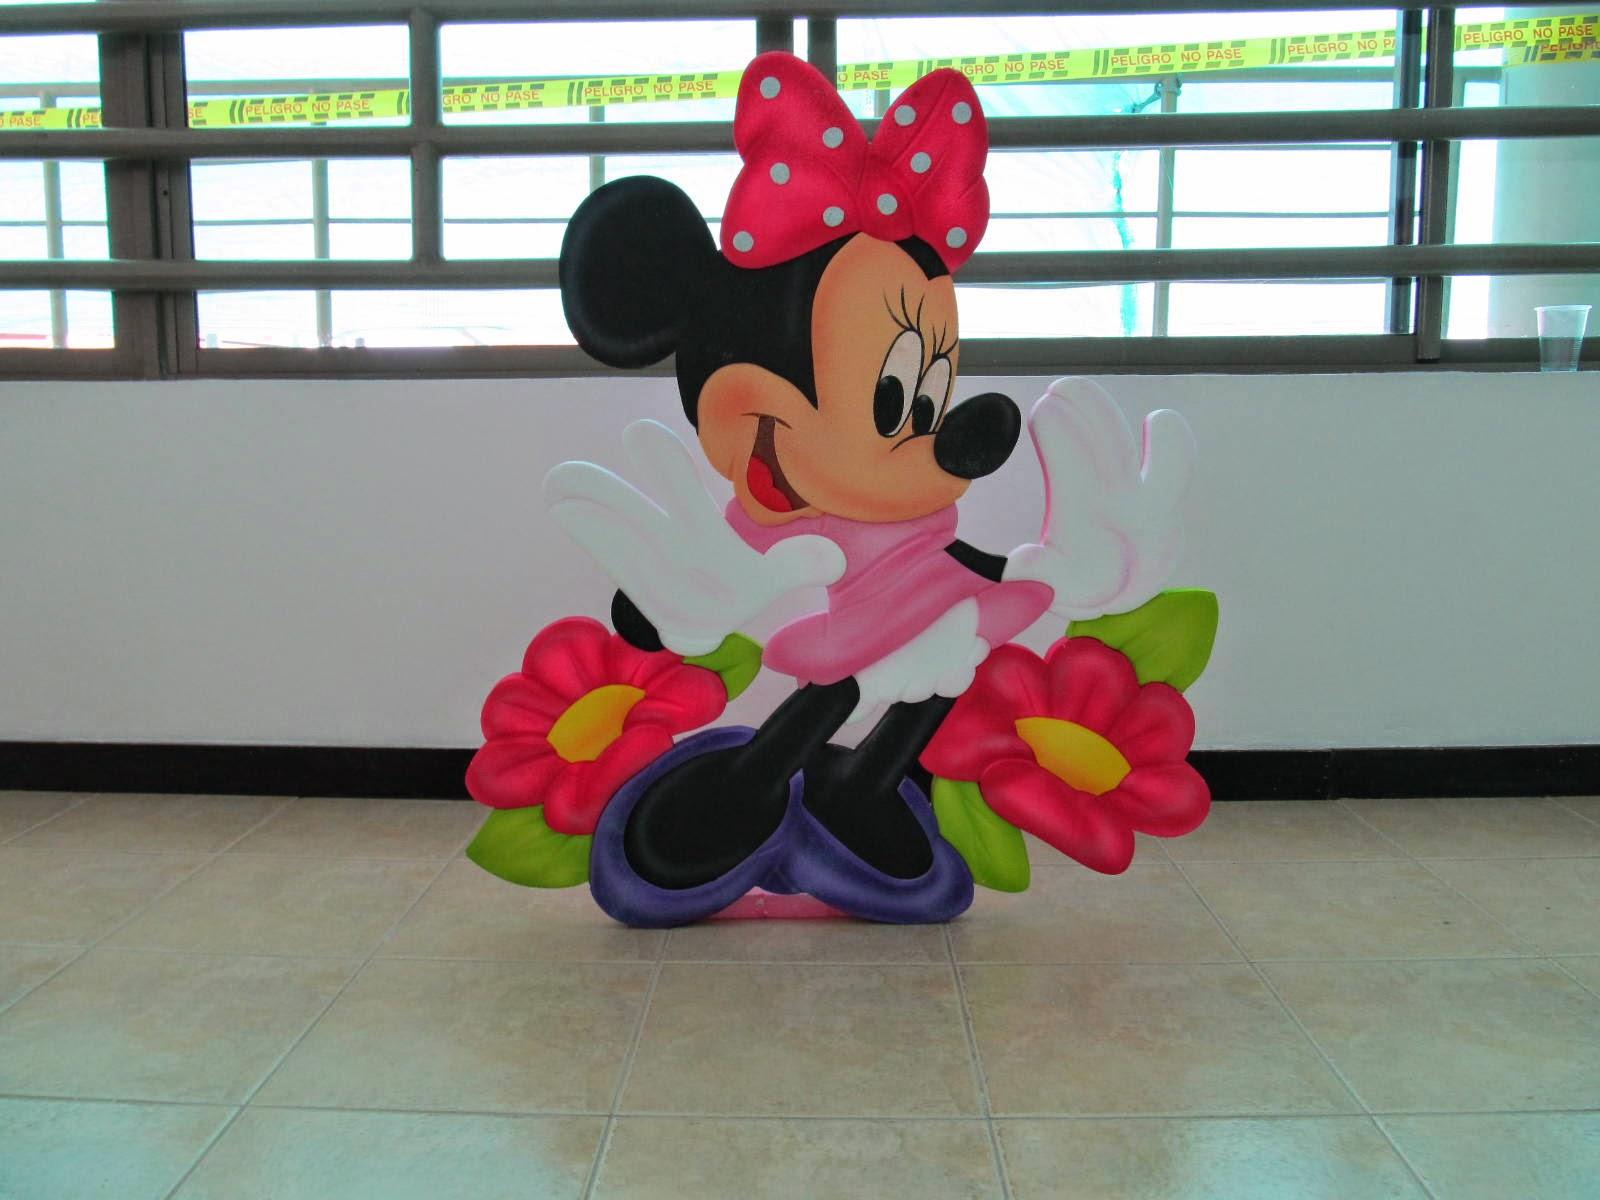 Decoracion Minnie Mouse Rosa ~ DECORACI?N FIESTA MINNIE MOUSE FIESTAS INFANTILES Y RECREACIONISTAS